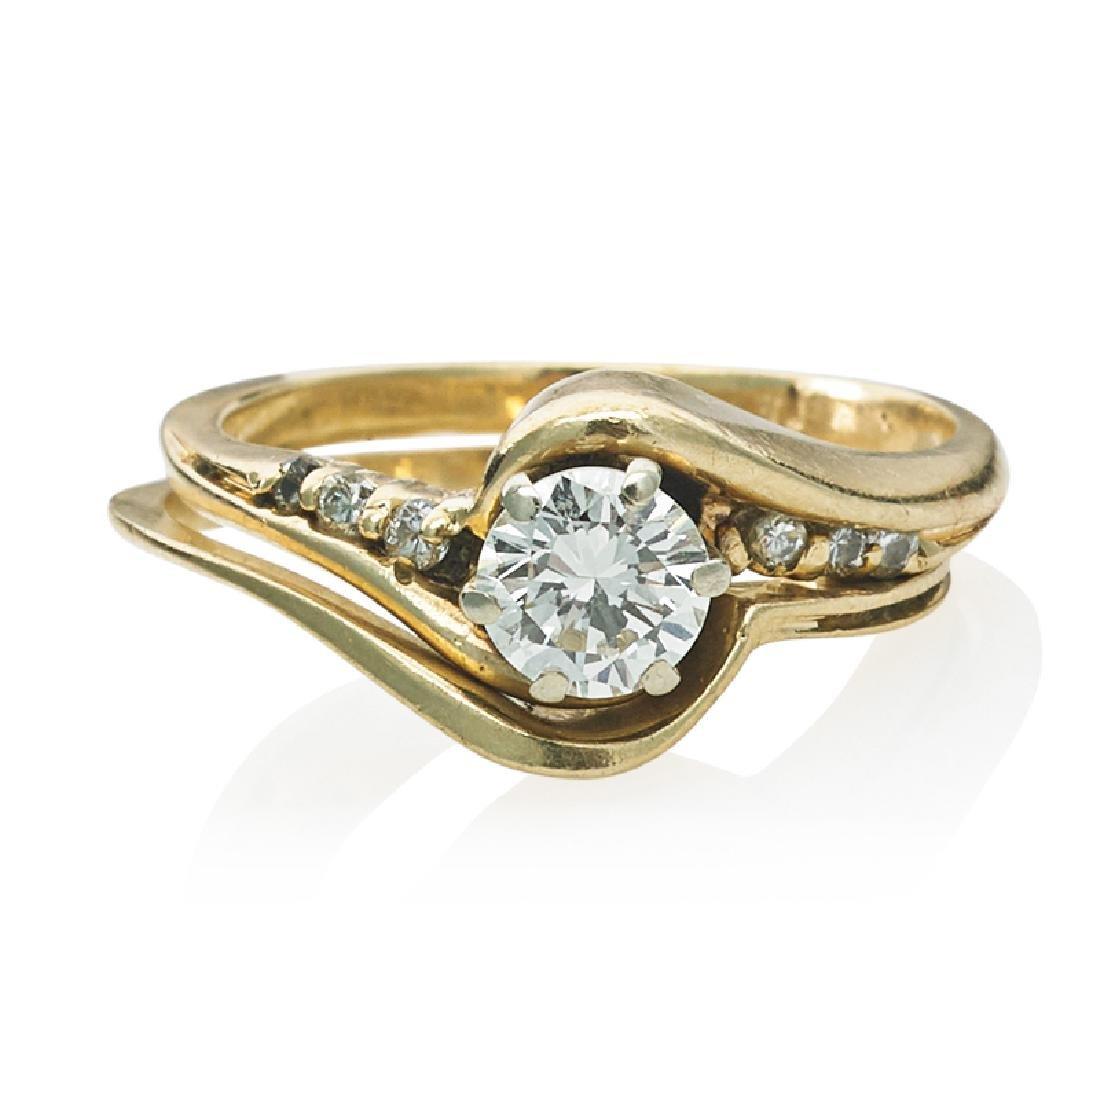 DIAMOND & YELLOW GOLD WEDDING RING SET